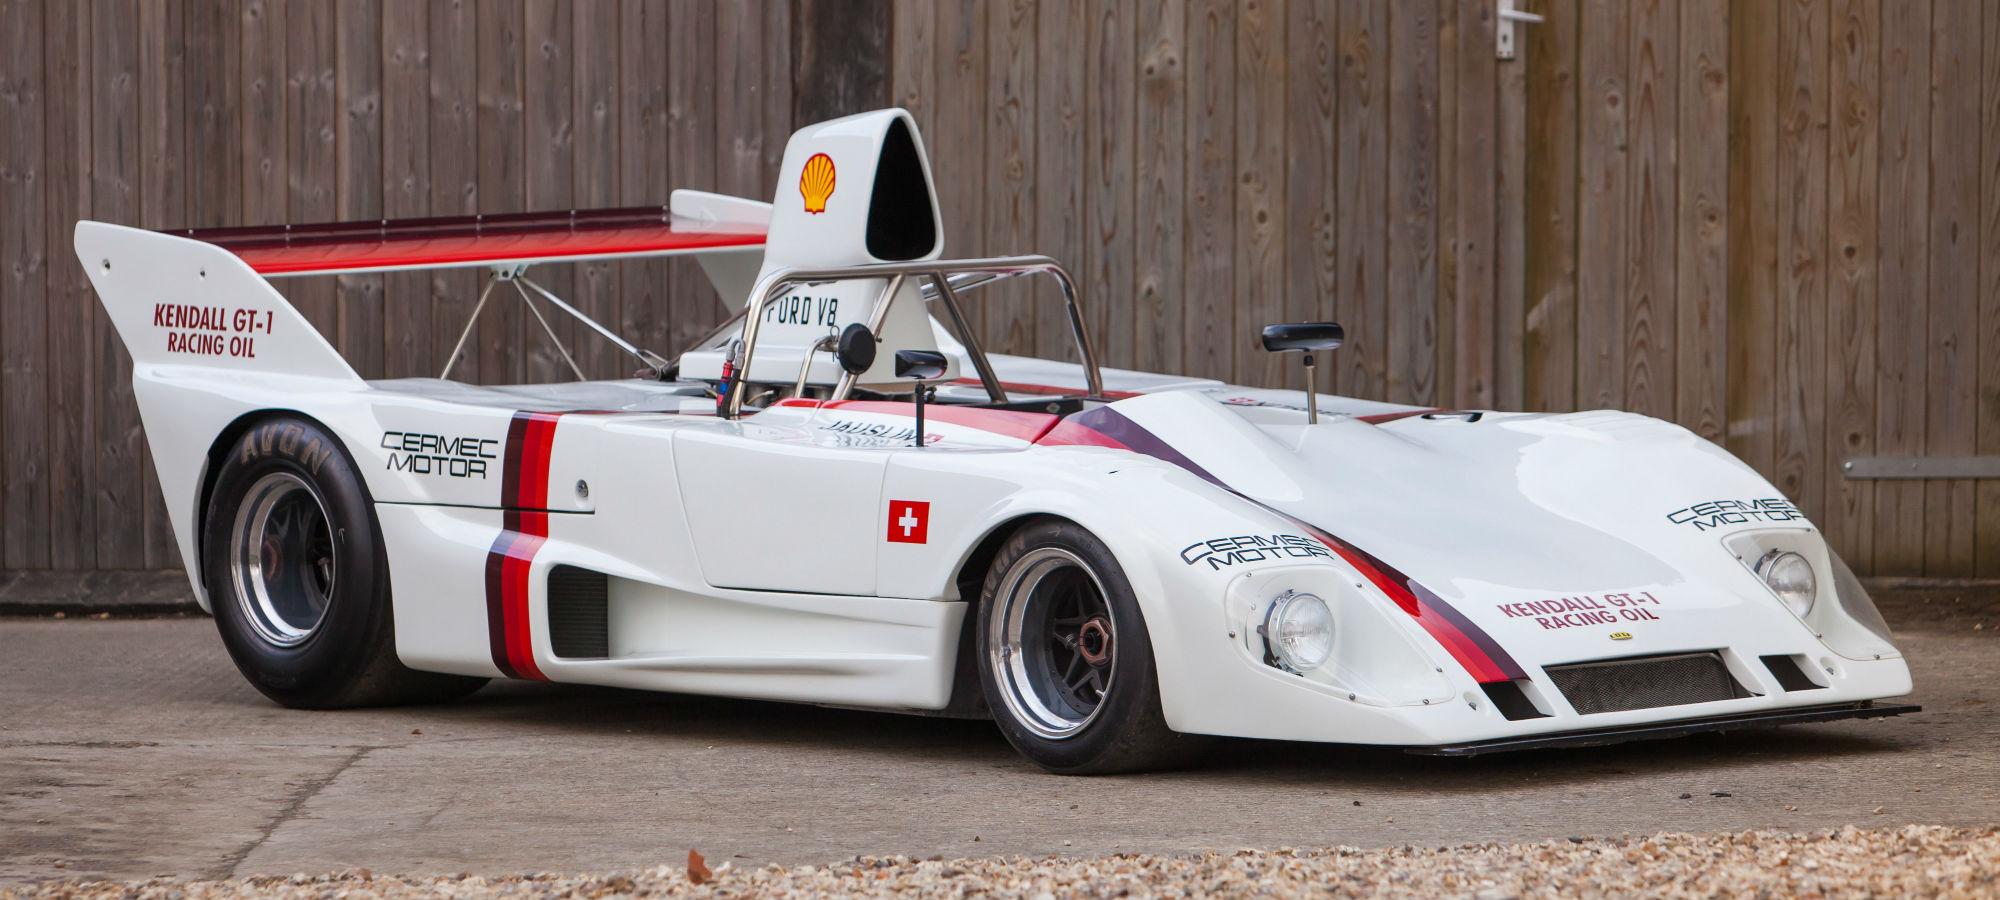 The Ex - Walter Lehmann, Ruedi Jauslin, Rosso Bianco Collection 1973 Lola T292 DFV